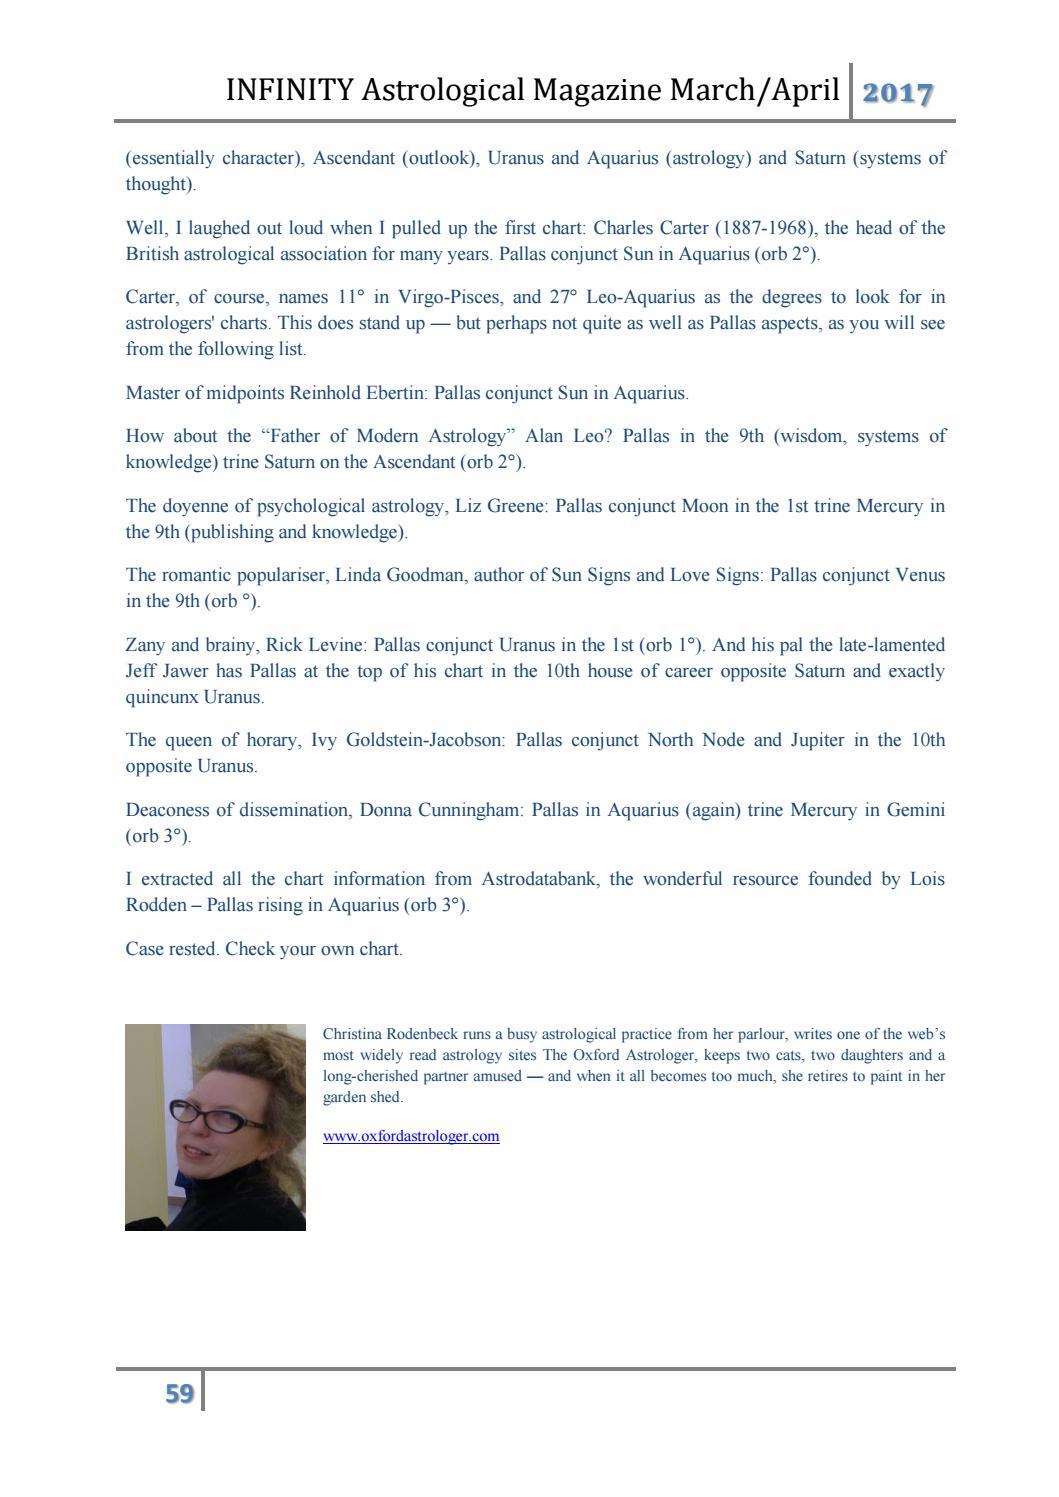 Infinity astrological magazine (i#12 by I A M  - Infinity